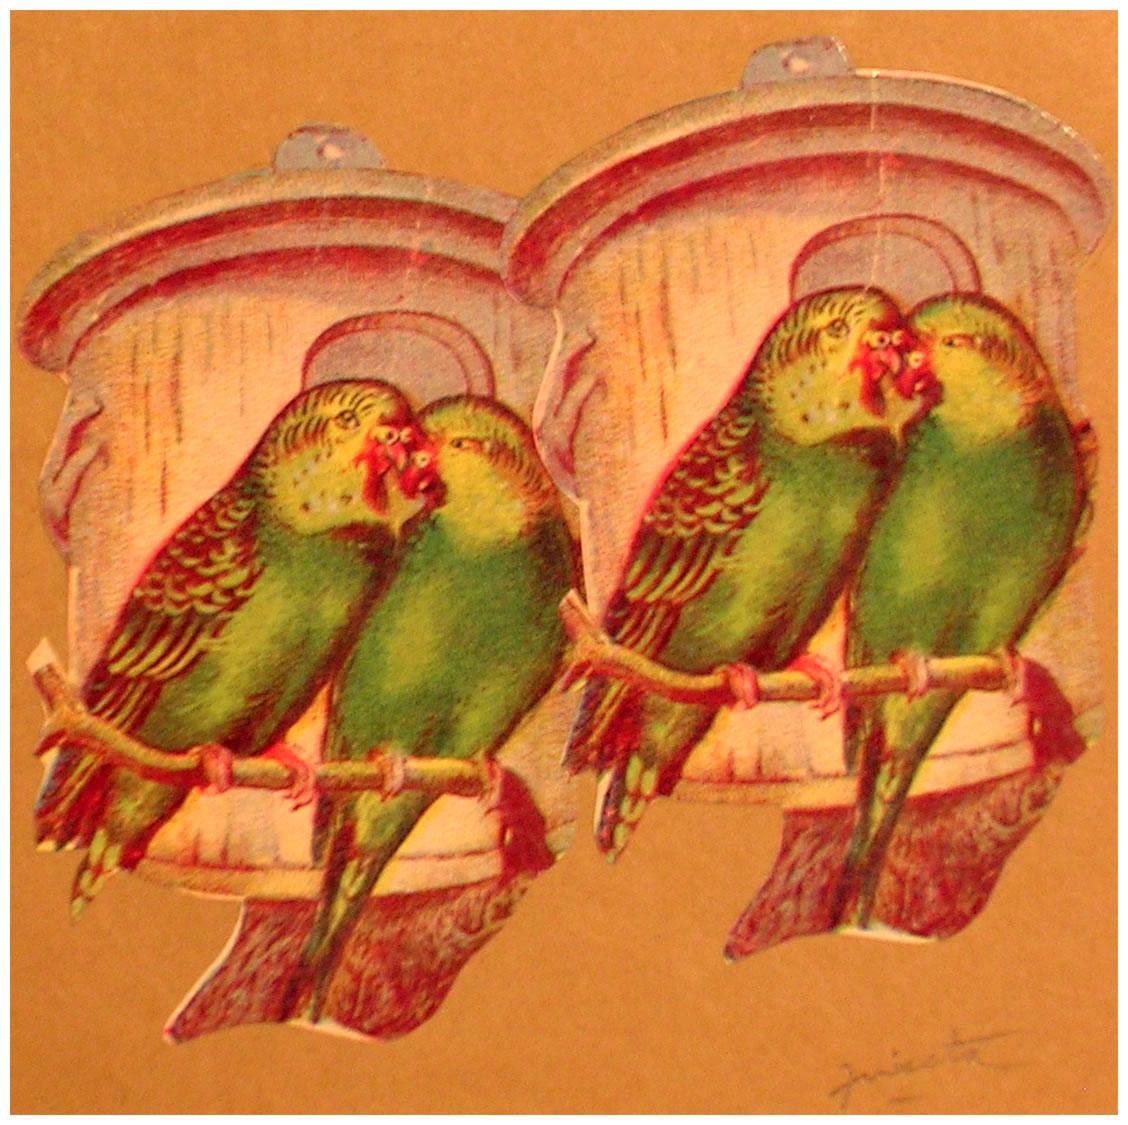 Loros,  papel collage, 15 cm x 15 cm, 1999